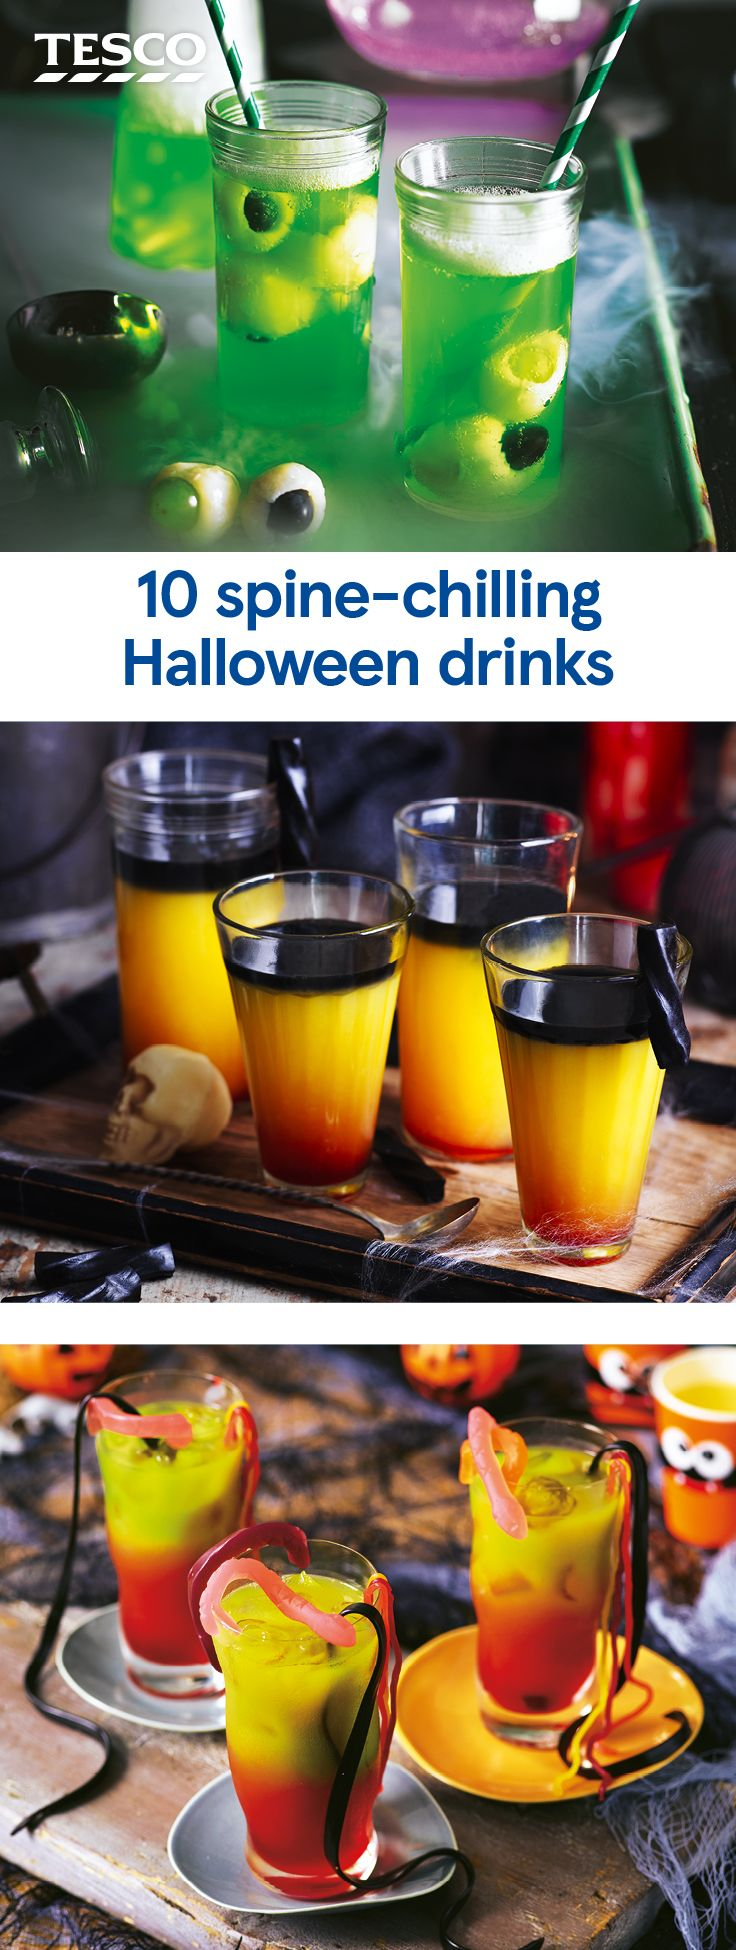 Halloween Cake Decorations Tesco : 78 best Halloween Tesco images on Pinterest Halloween ...